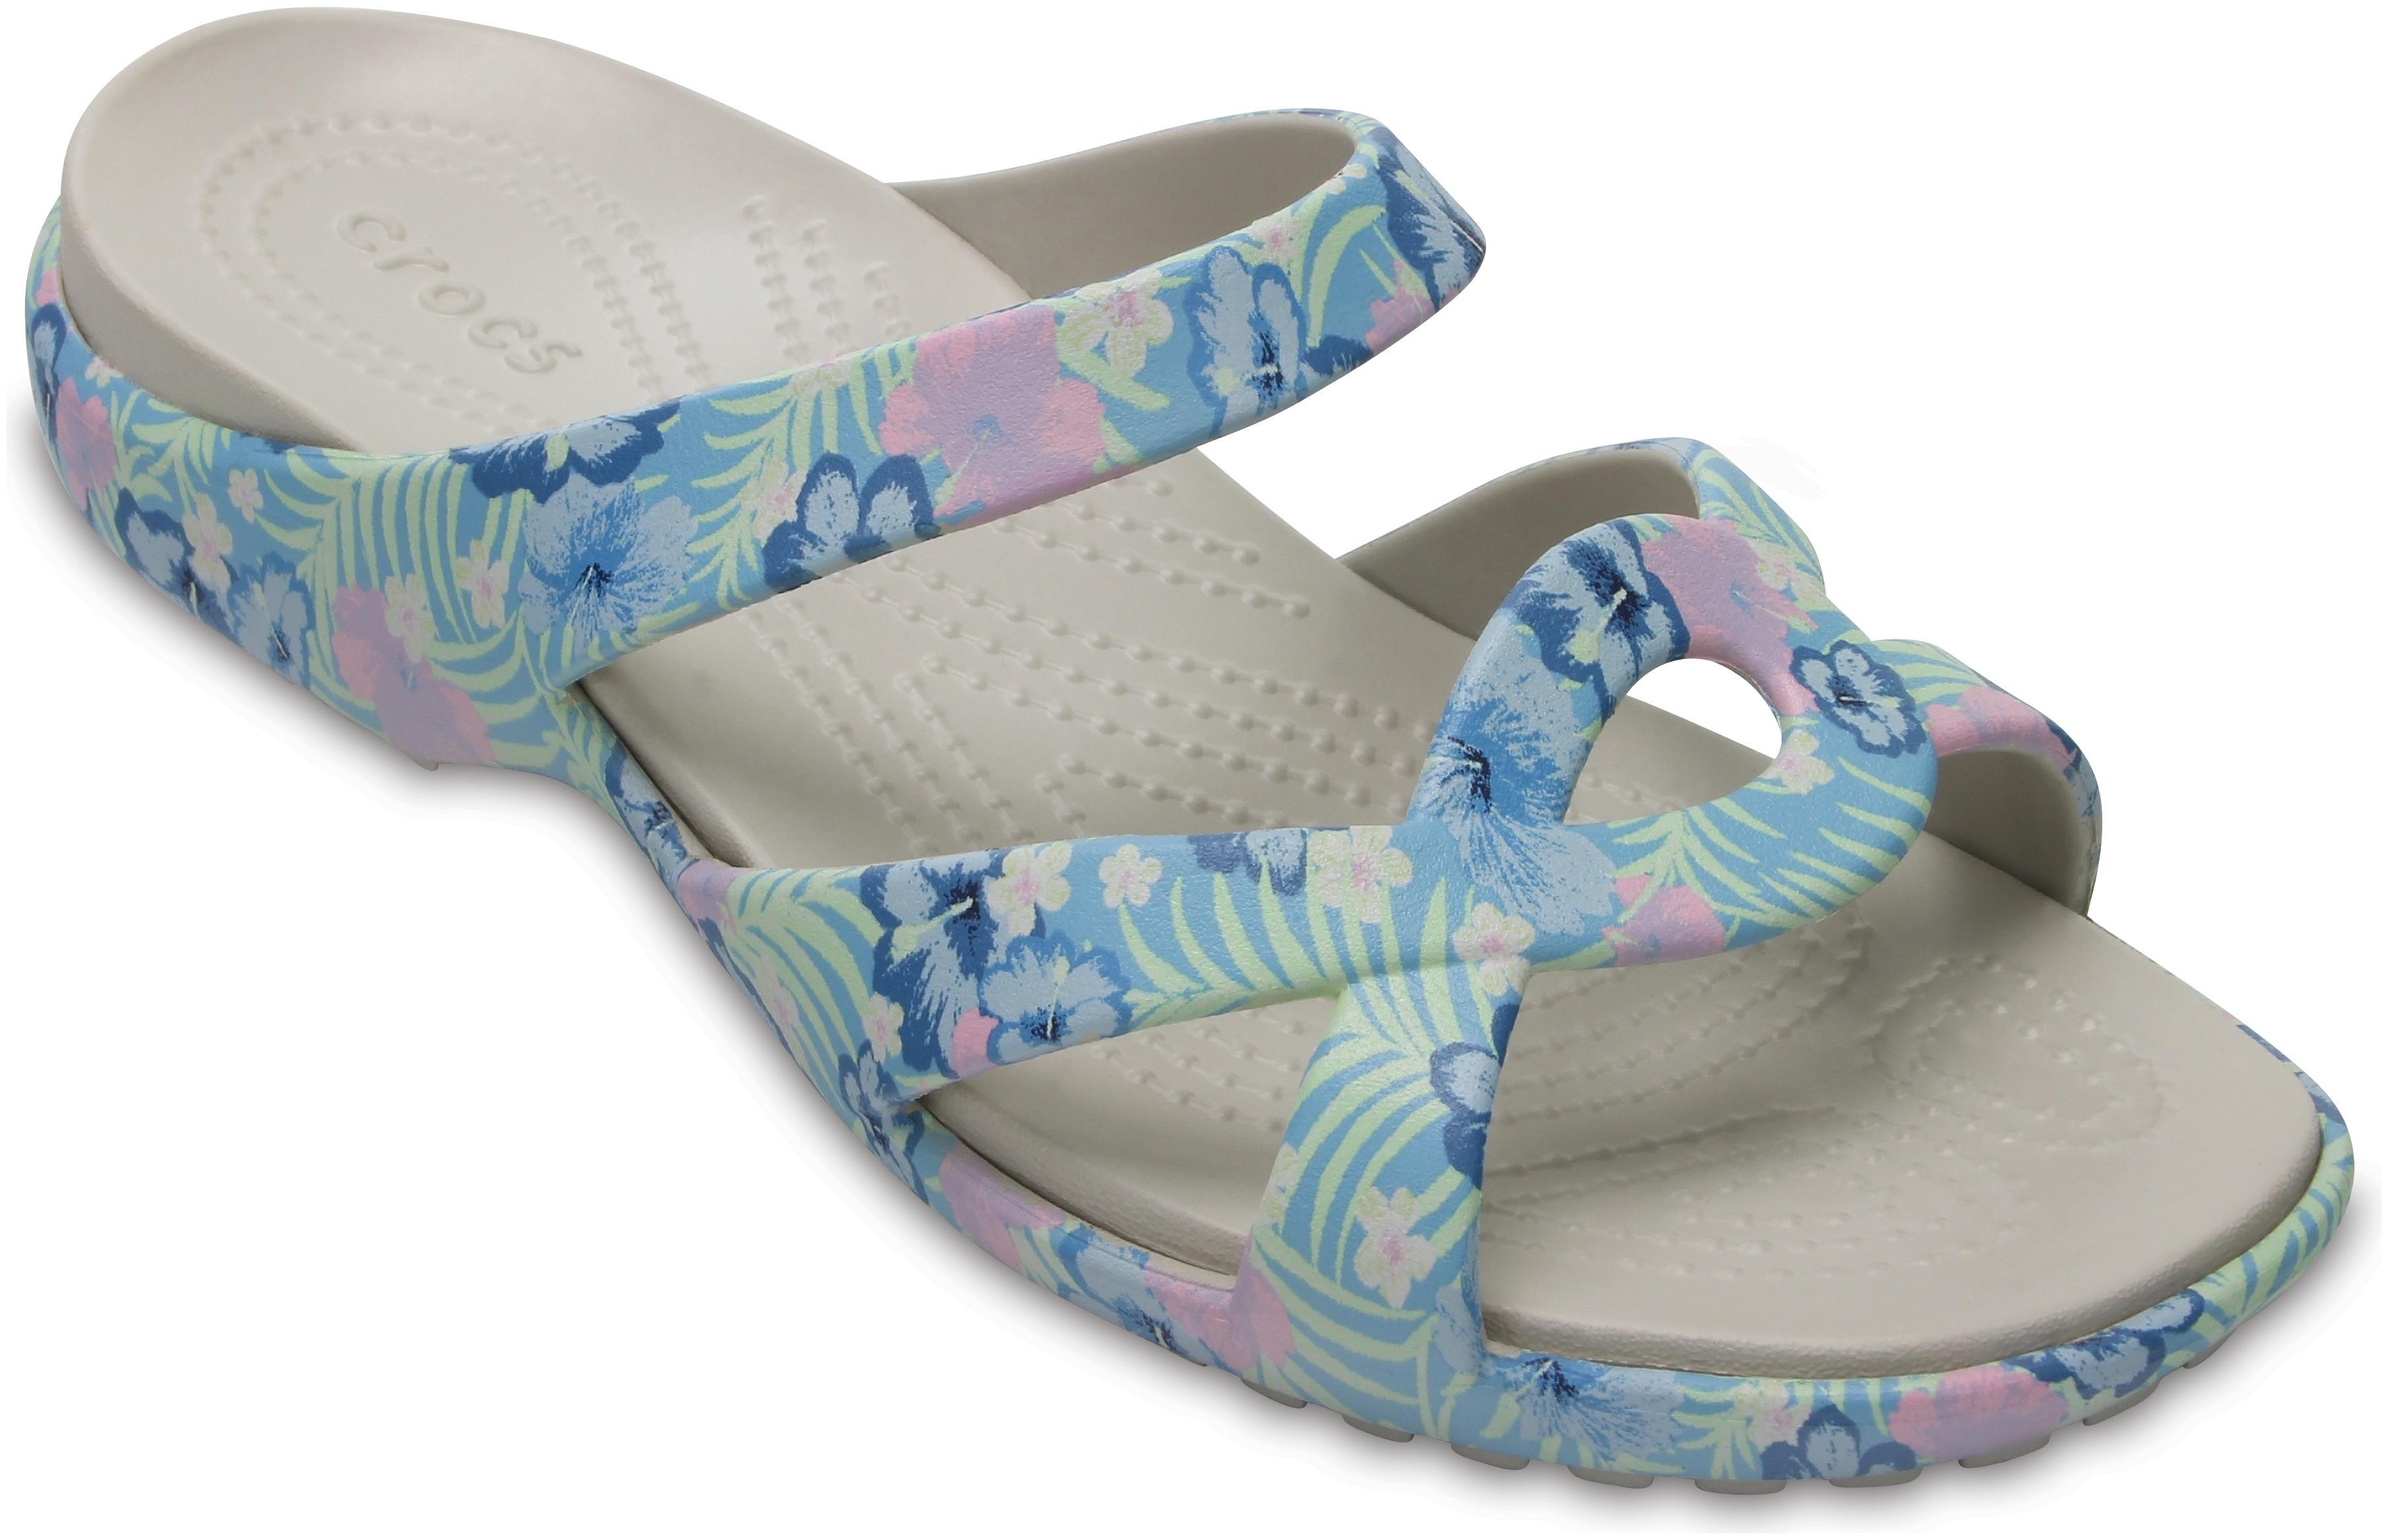 cd0edf2de32f Crocs Meleen Twist Graphic Navy Blue Sandals for women - Get stylish ...